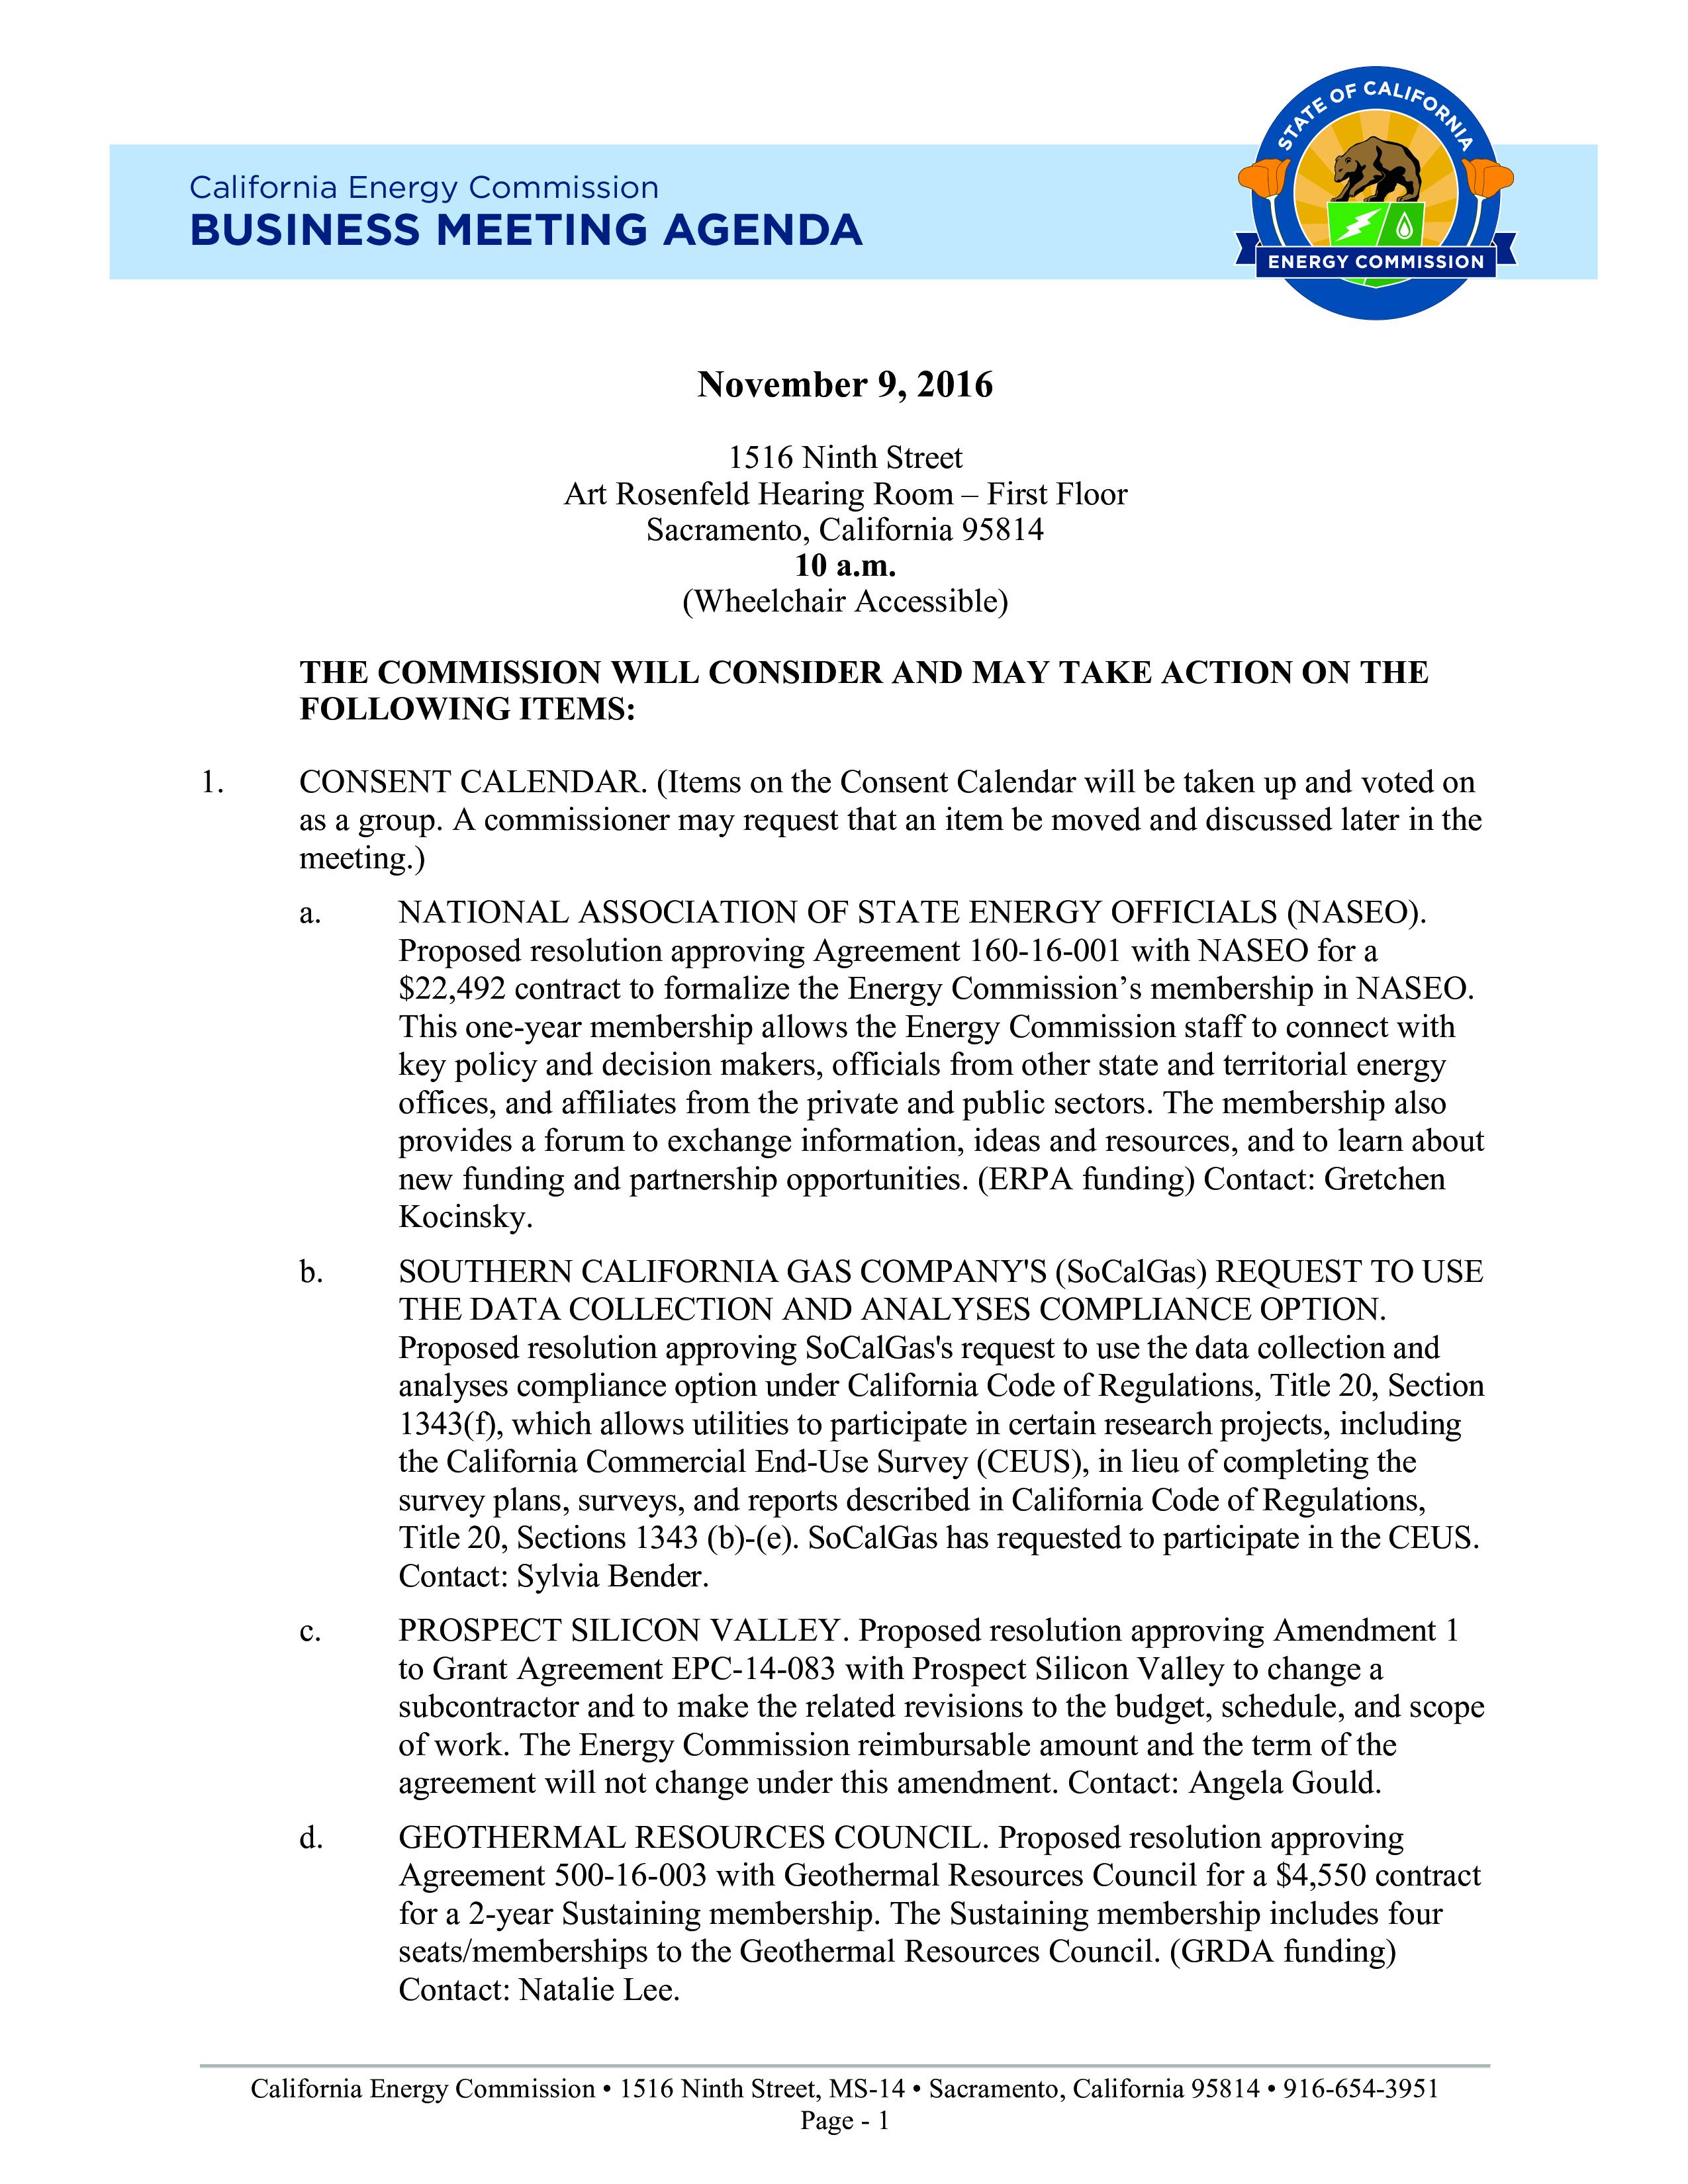 Business Meeting Agenda Format Main Image